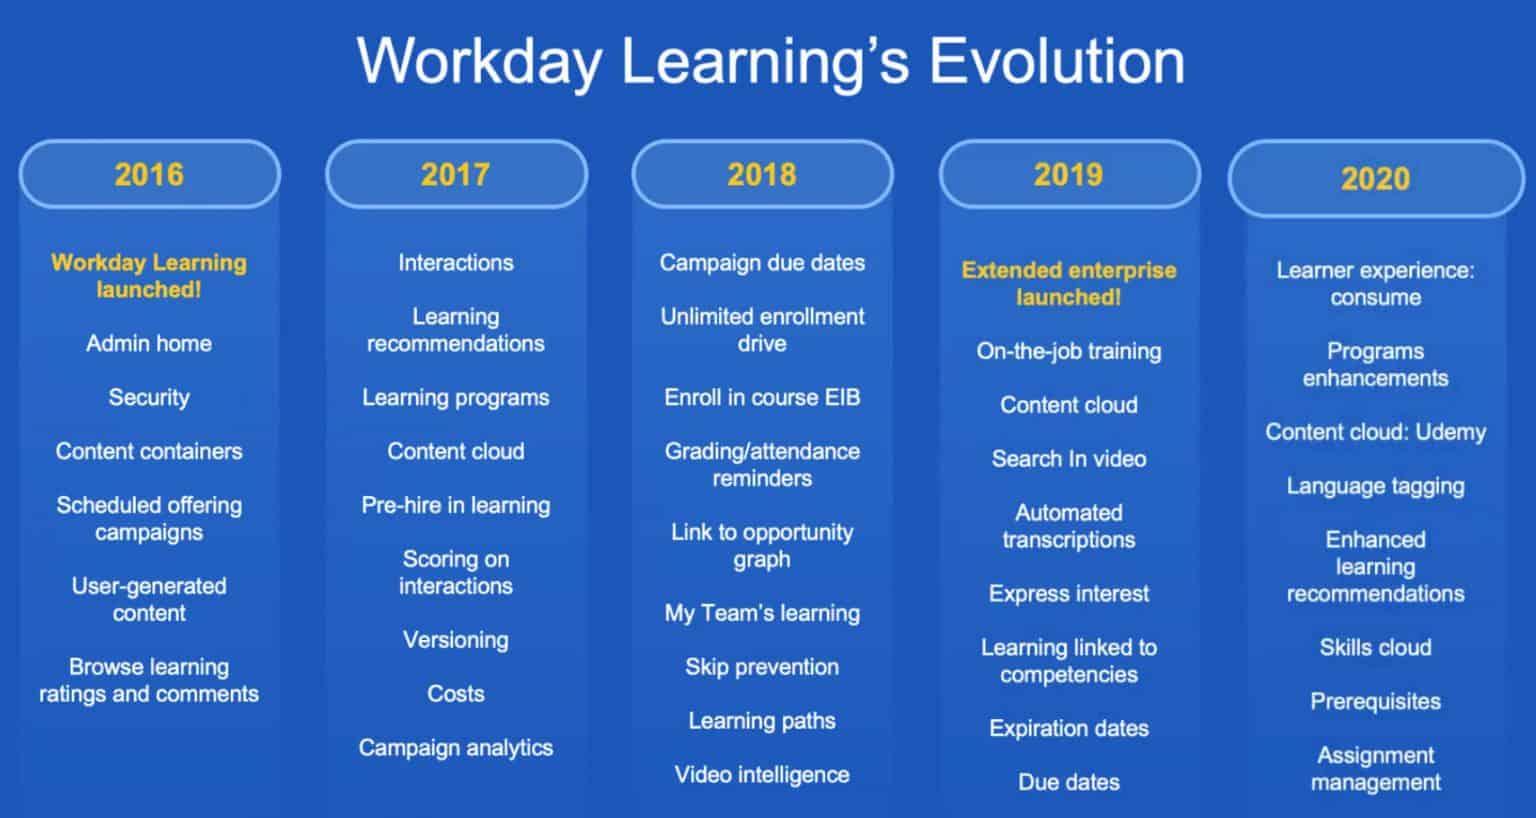 大咖谈:Workday Learning 学习发展未来新模式?